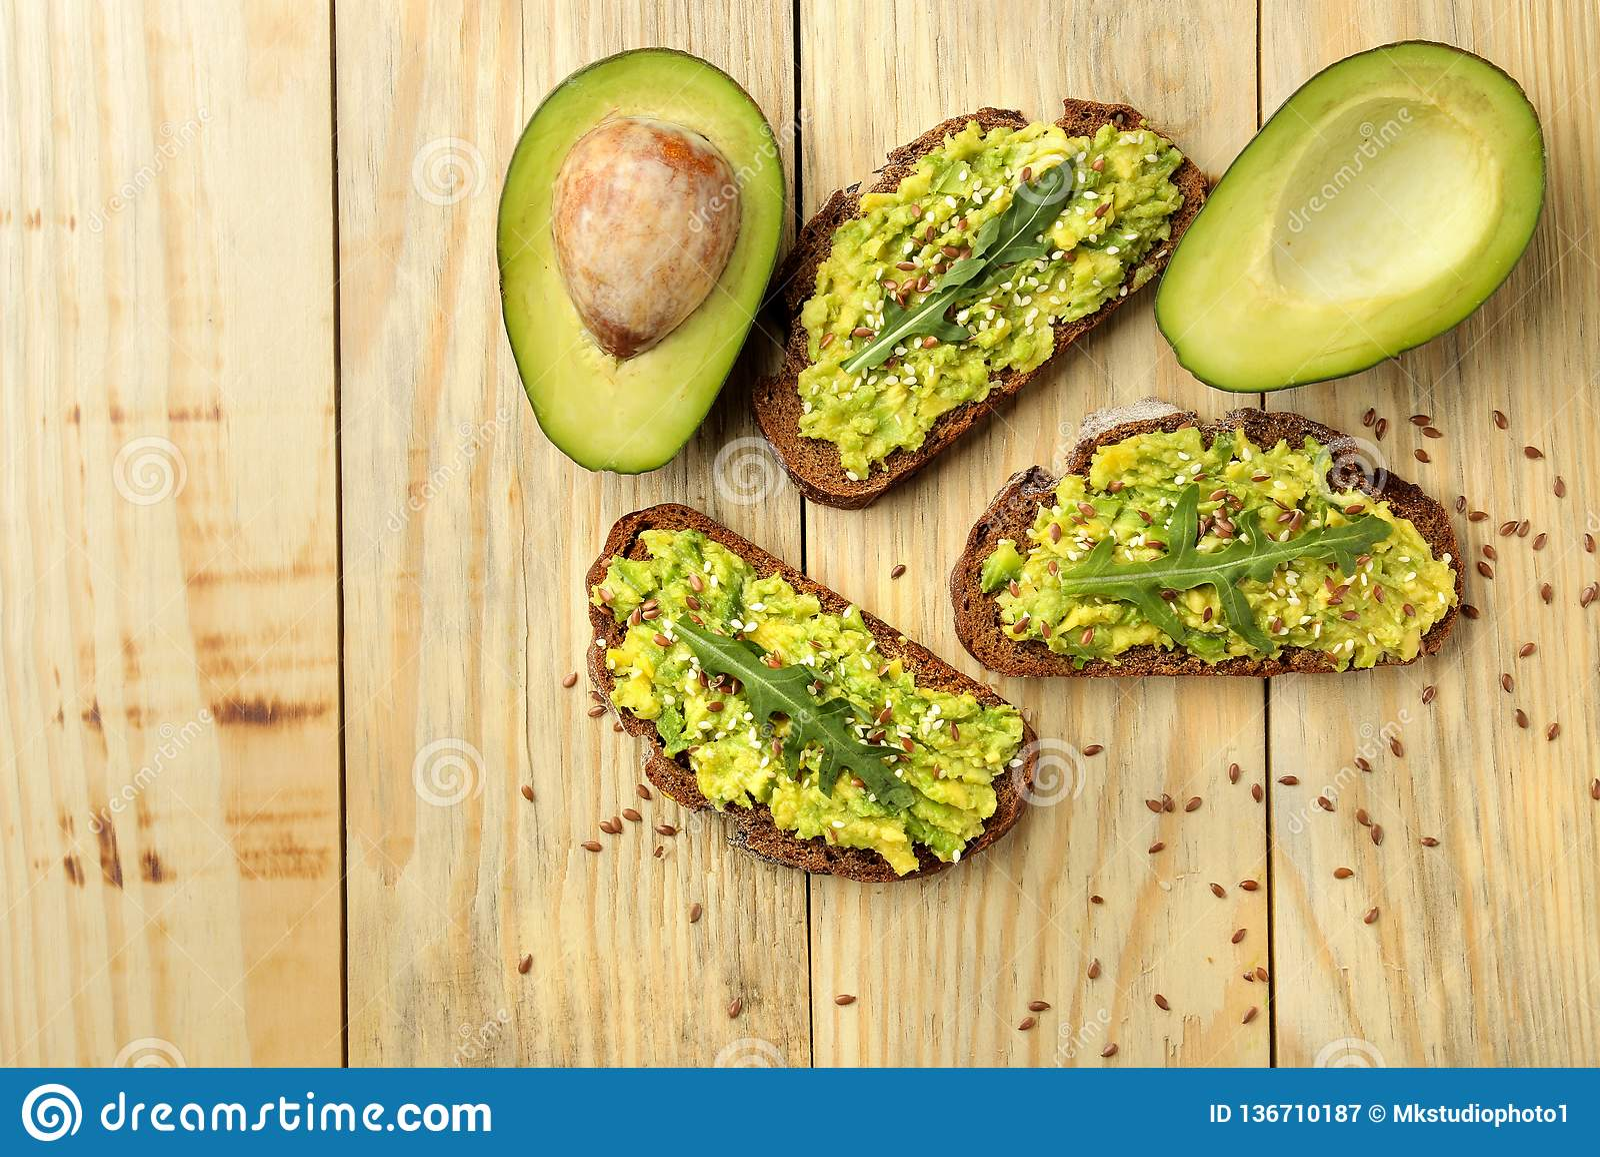 Avocado And Arugula Sandwiches Closeup On Natural Wooden ...